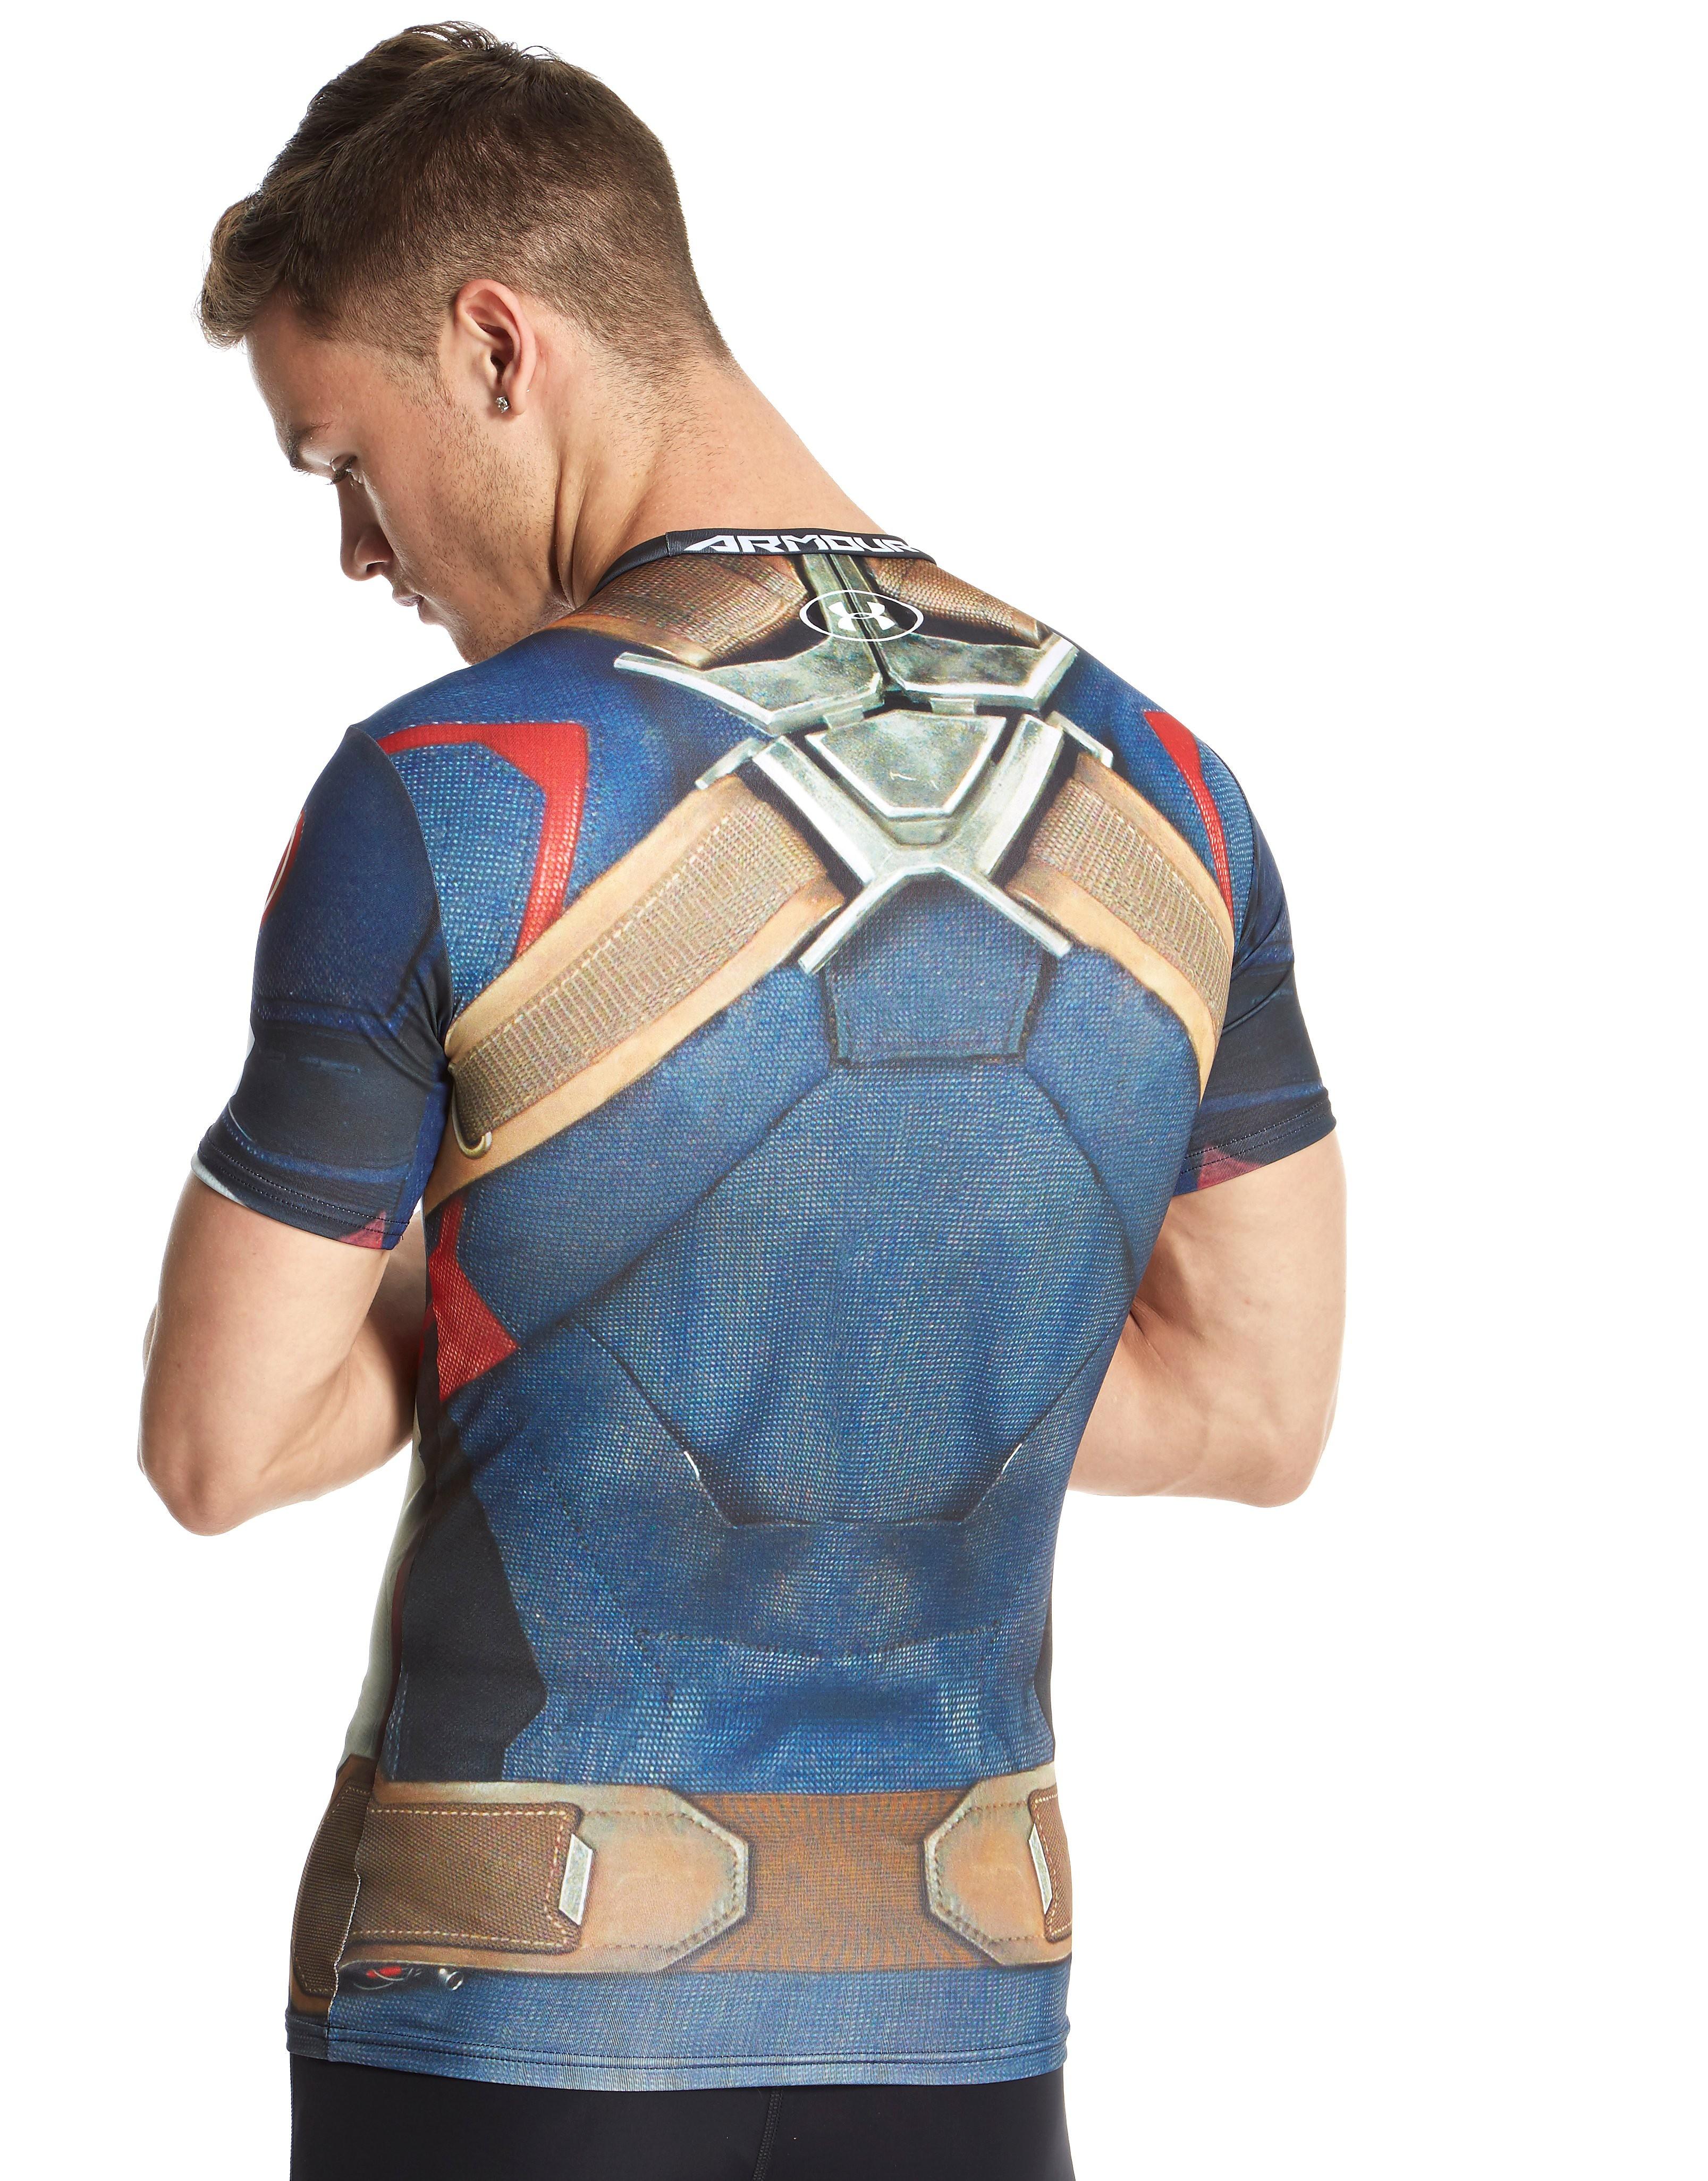 Under Armour Captain America Compression Shirt